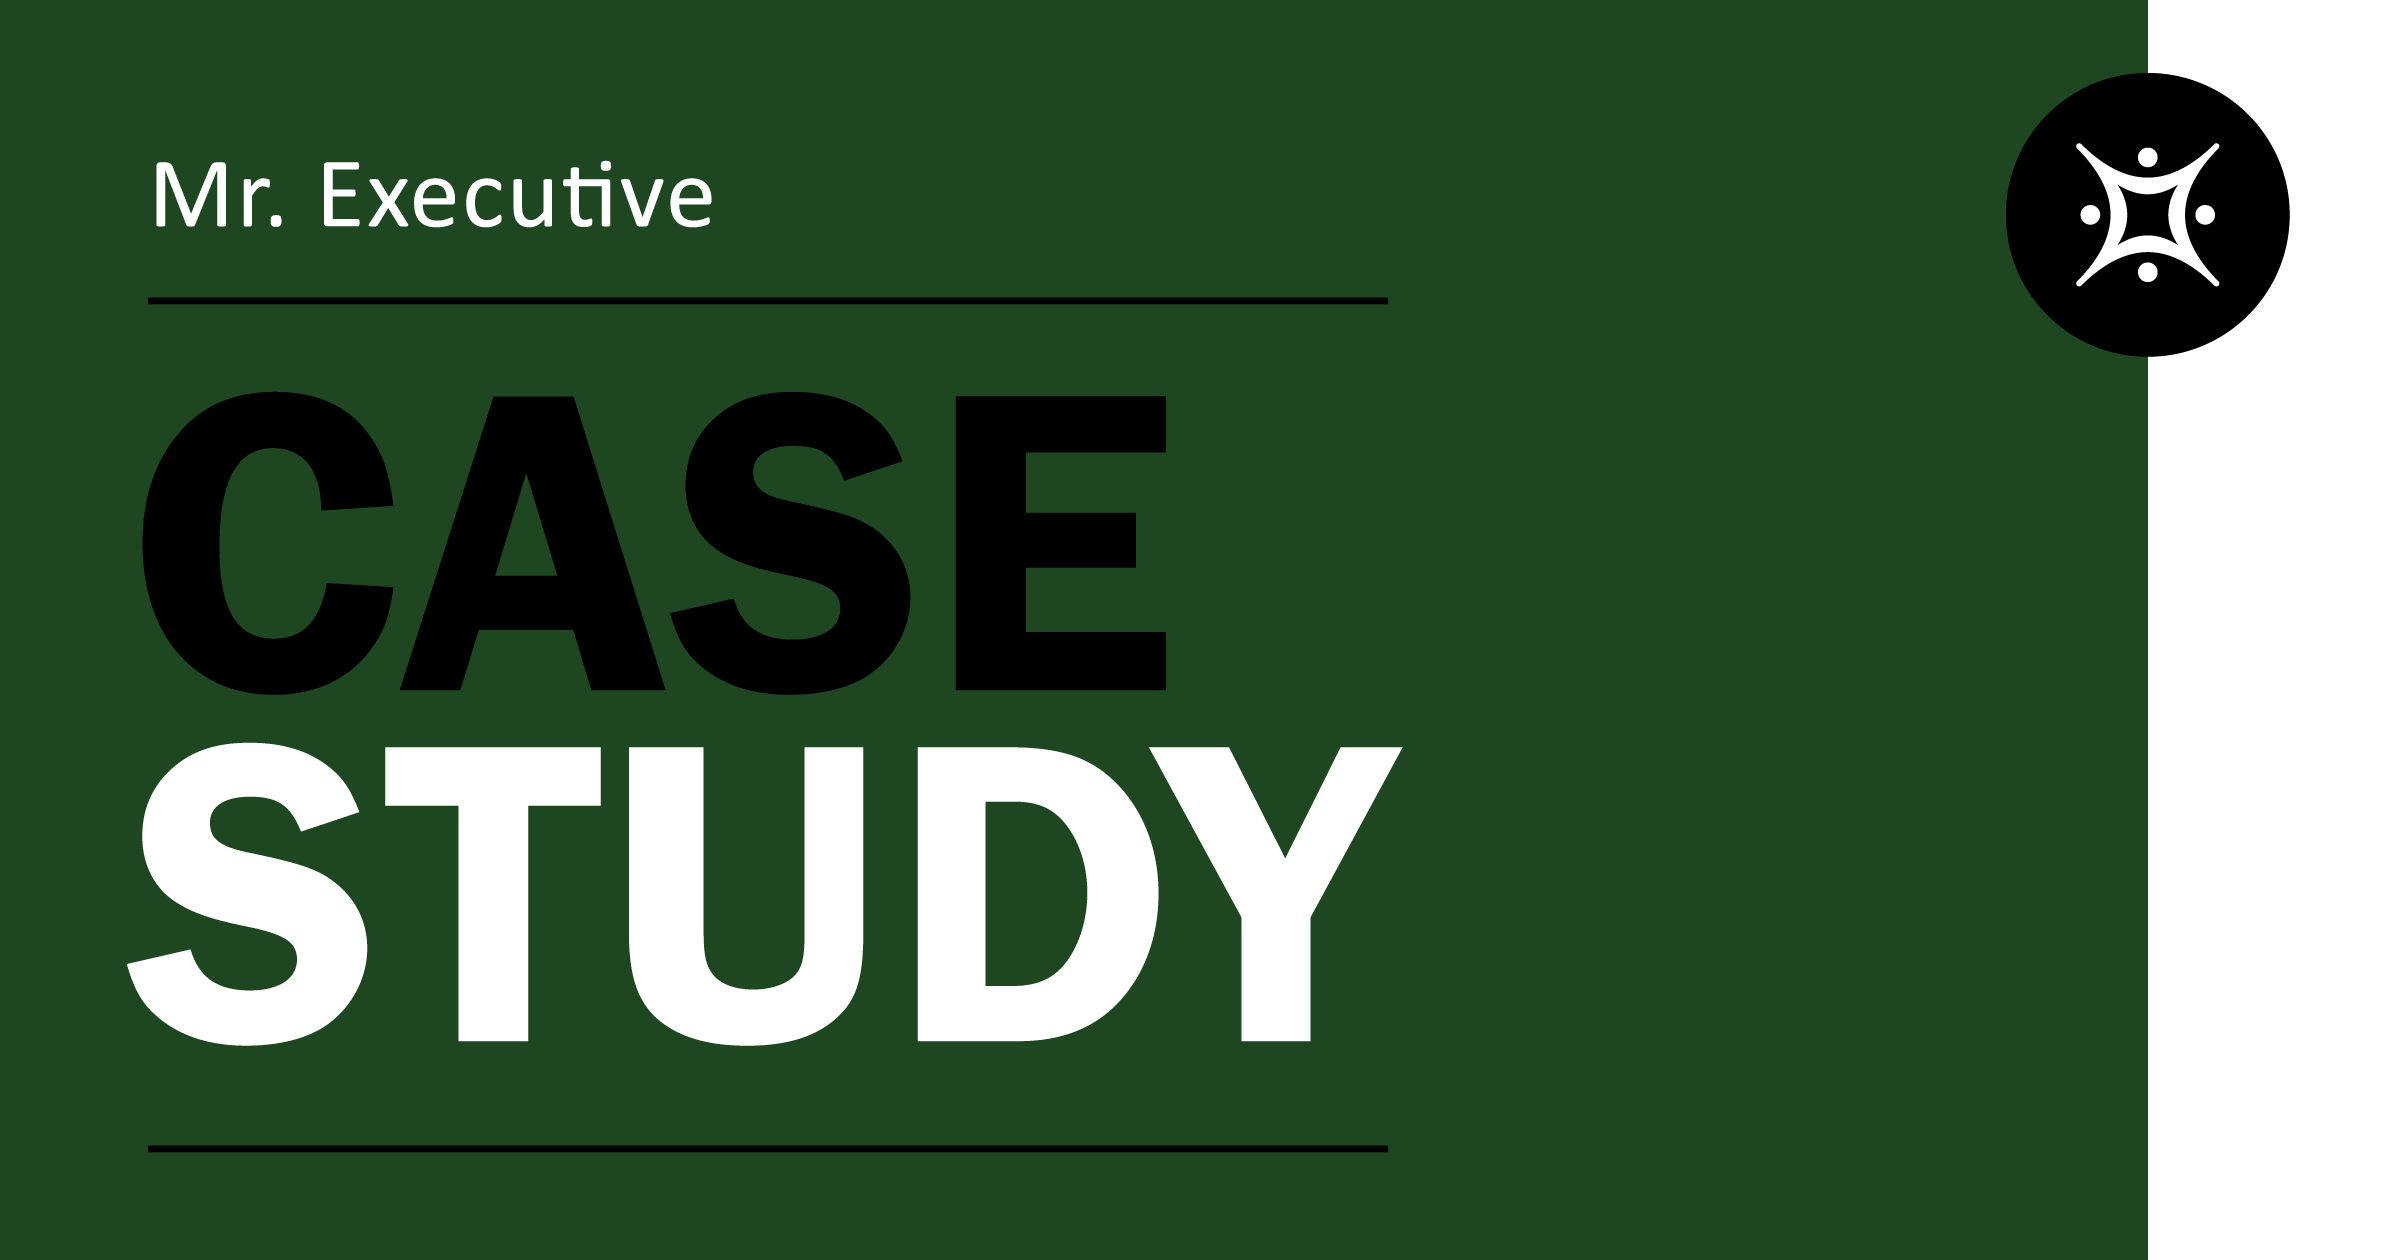 Case Study: Mr. Executive